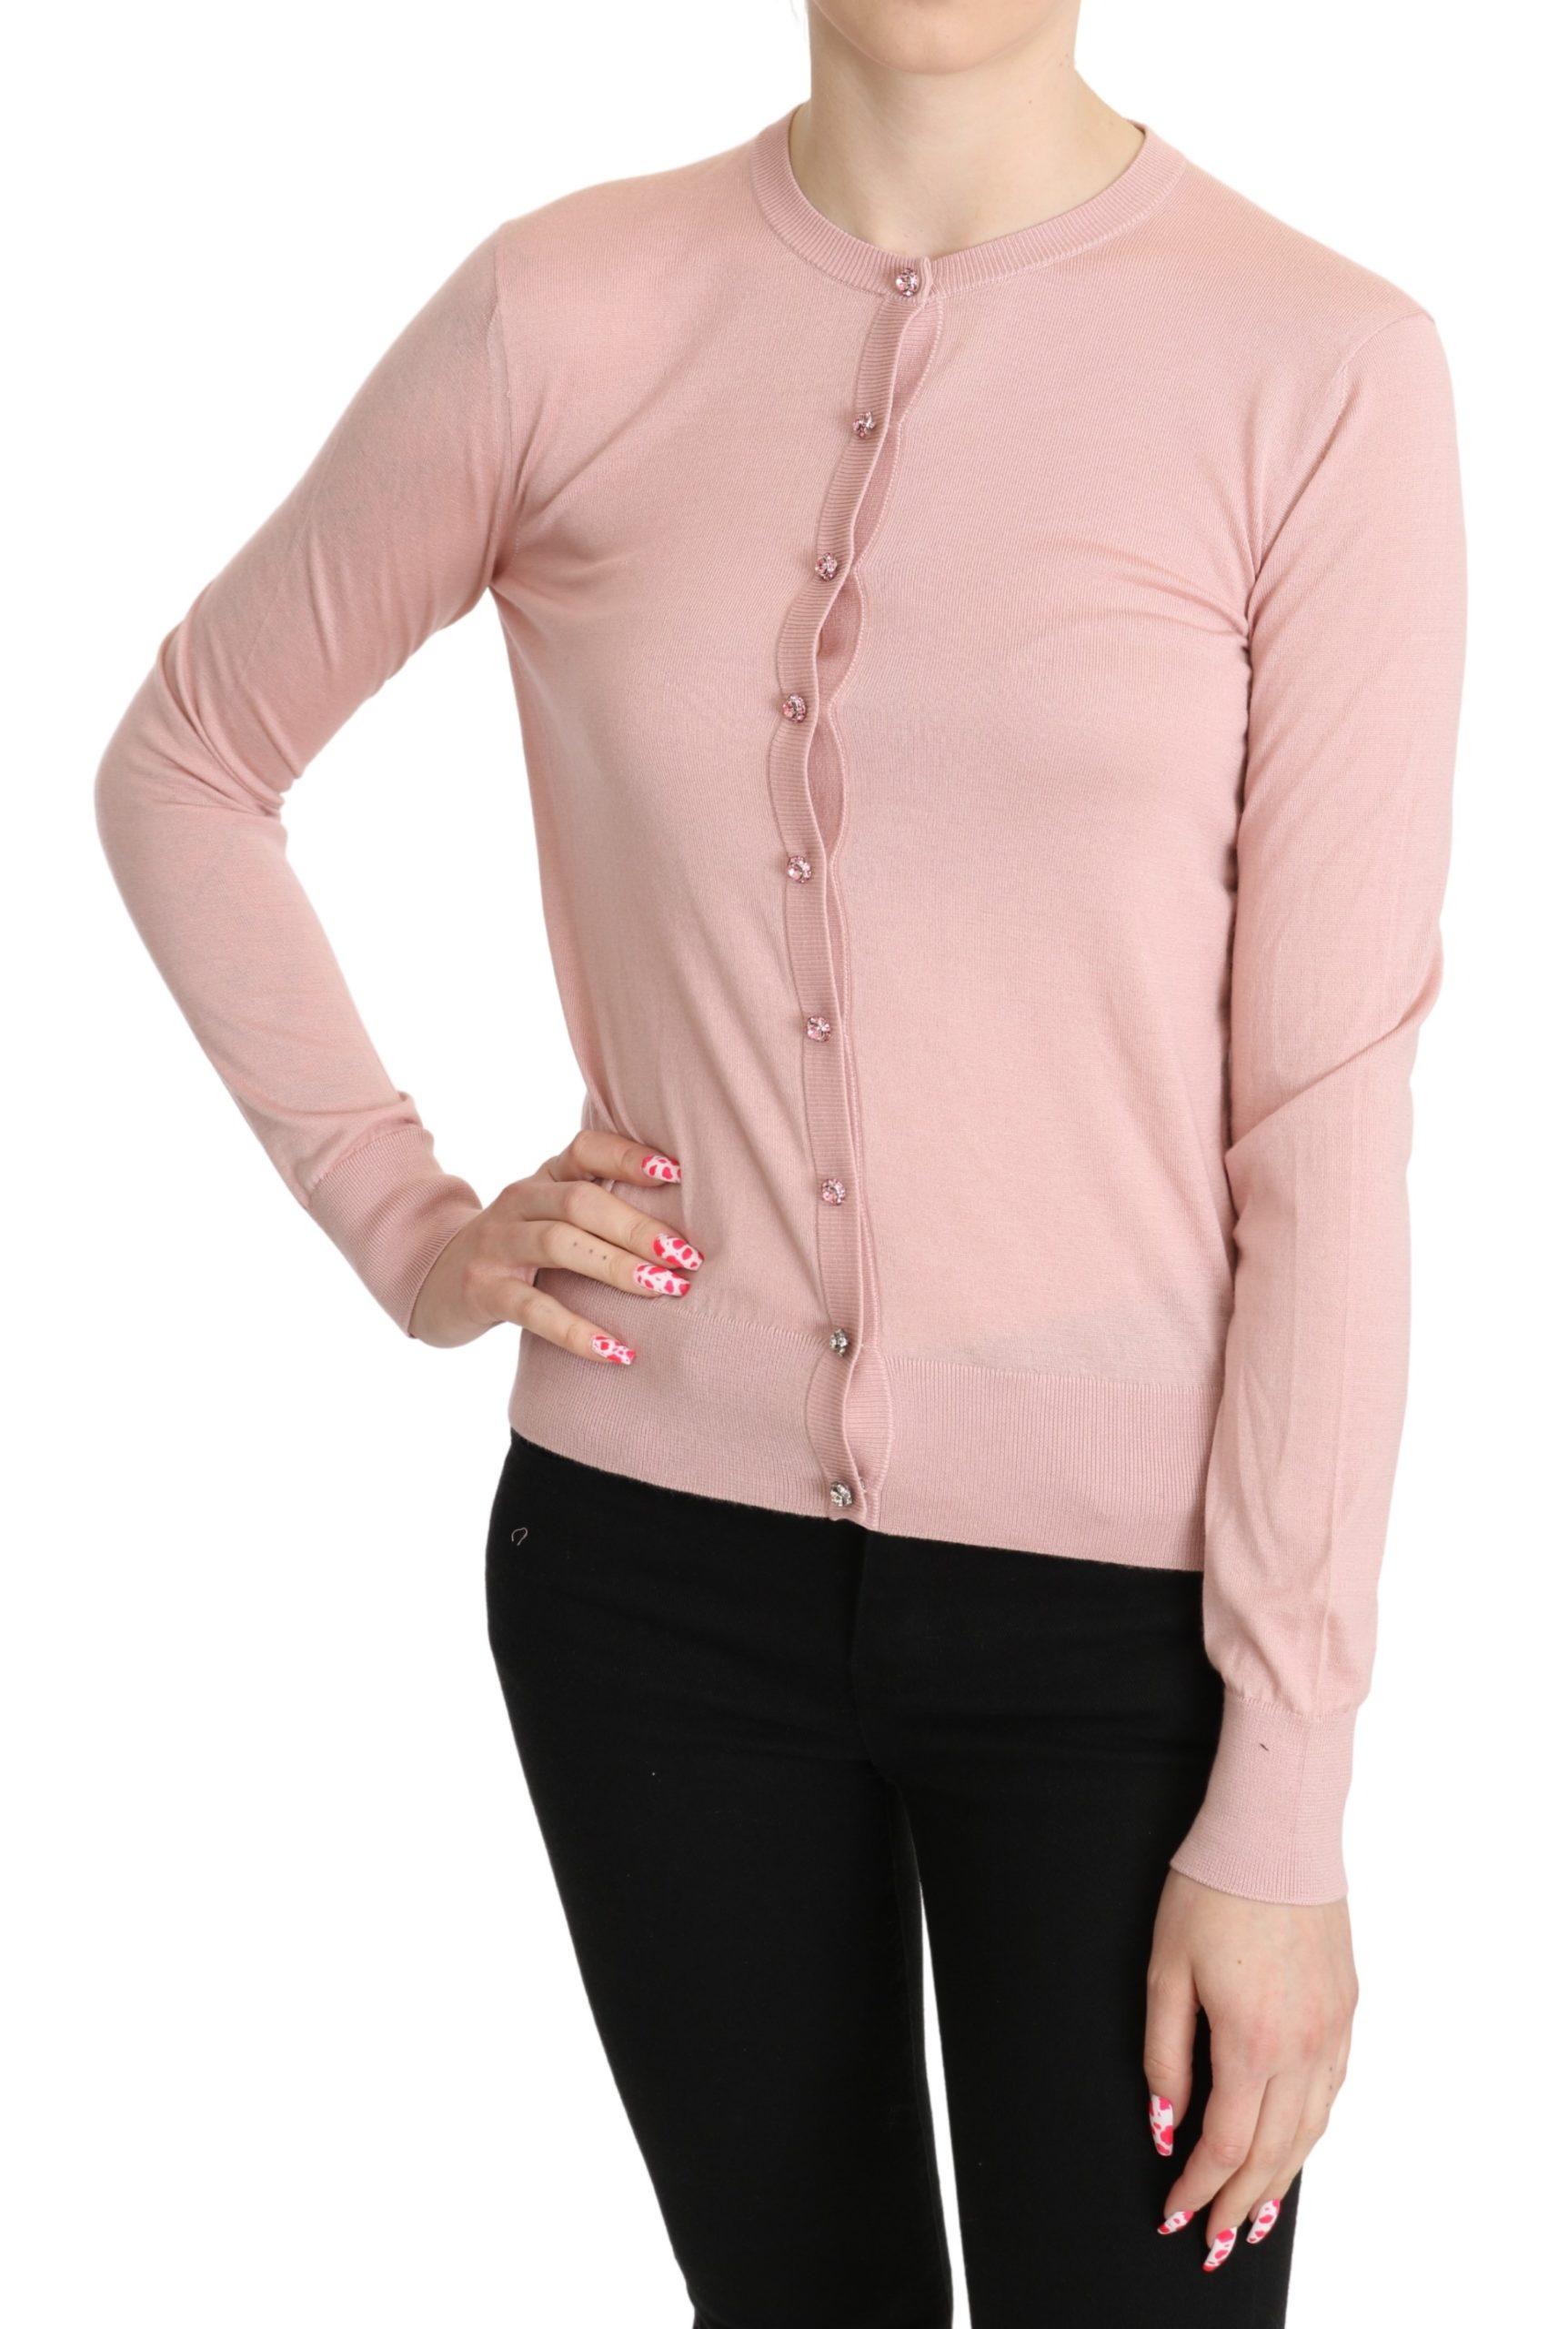 Dolce & Gabbana Women's Cashmere LS Cardigan Pink TSH5273 - IT38|XS